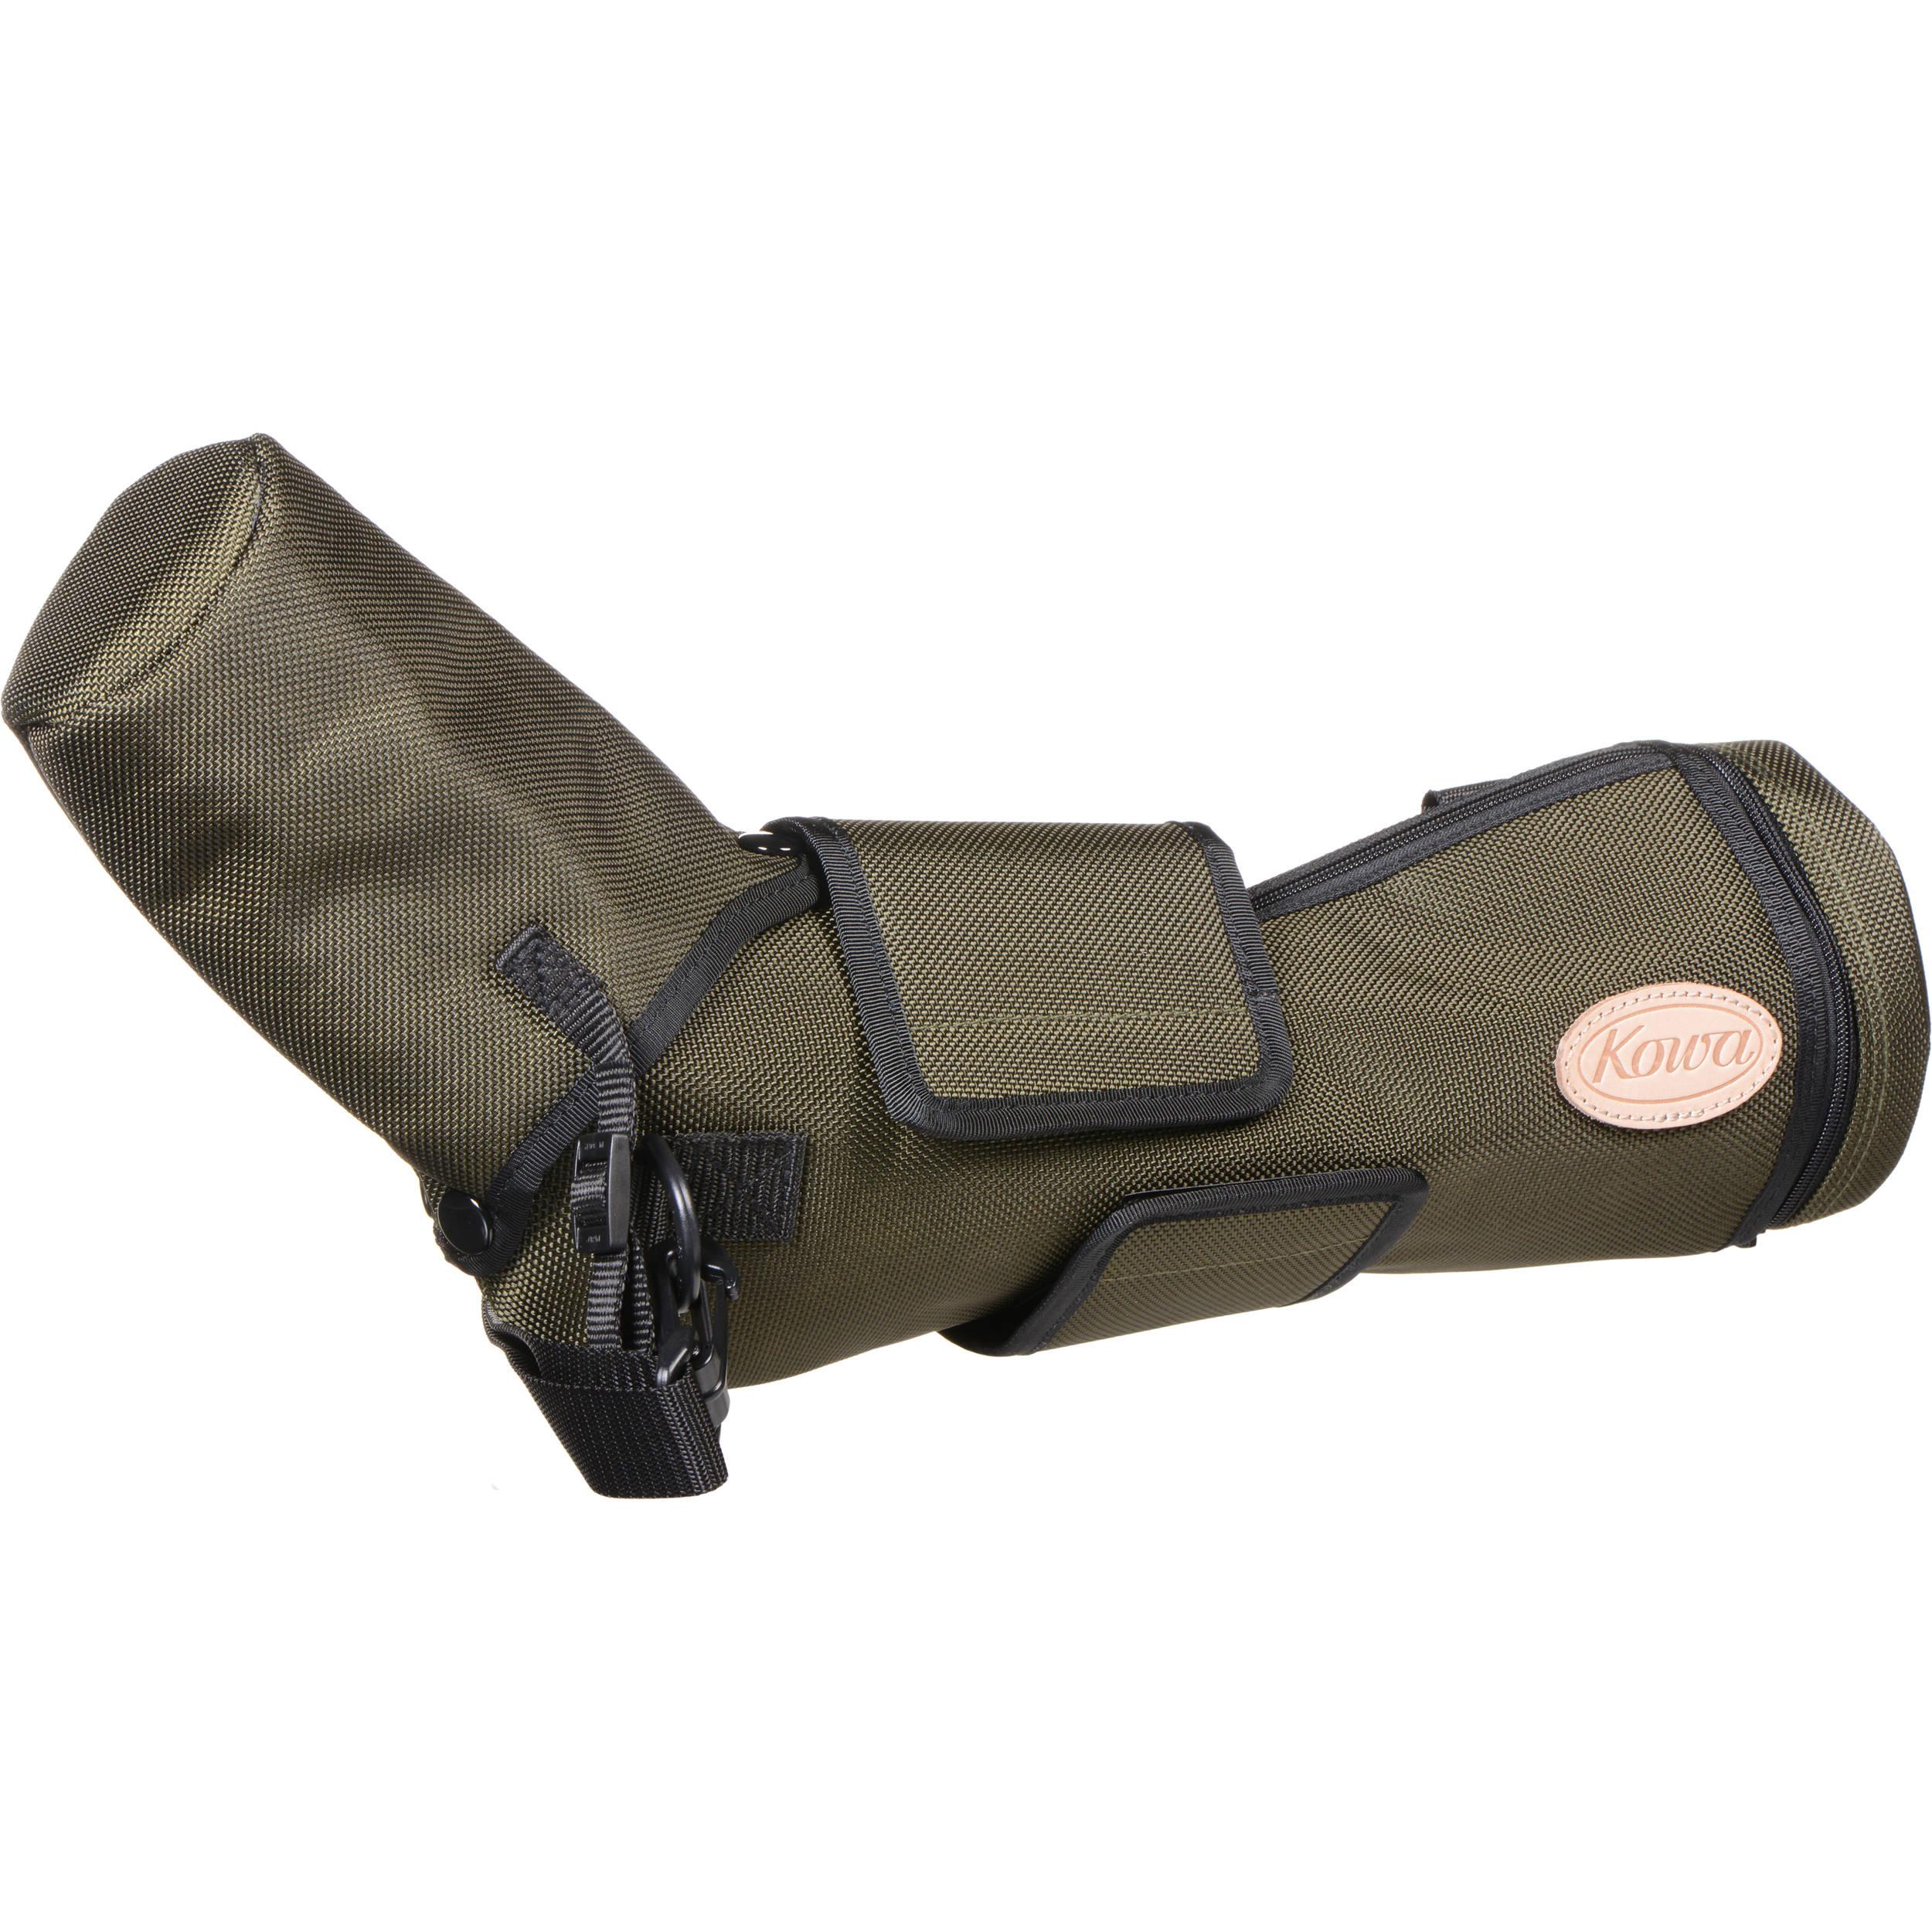 Buy Cheap Swarovski Neoprene Carry Strap For Scope Stay-on-casein Excellent Condition Binoculars & Telescopes